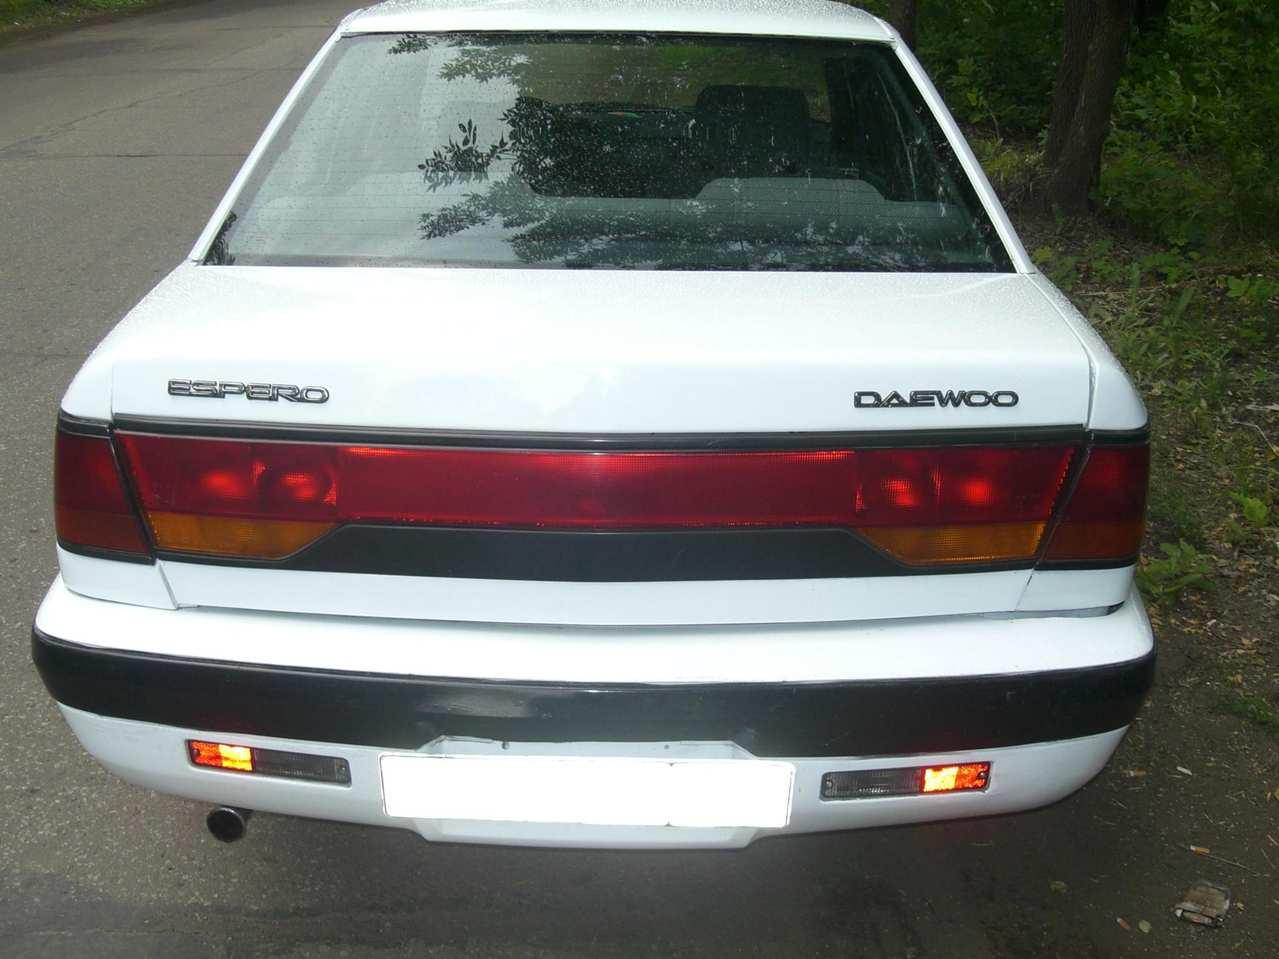 1993 Daewoo Espero Pictures